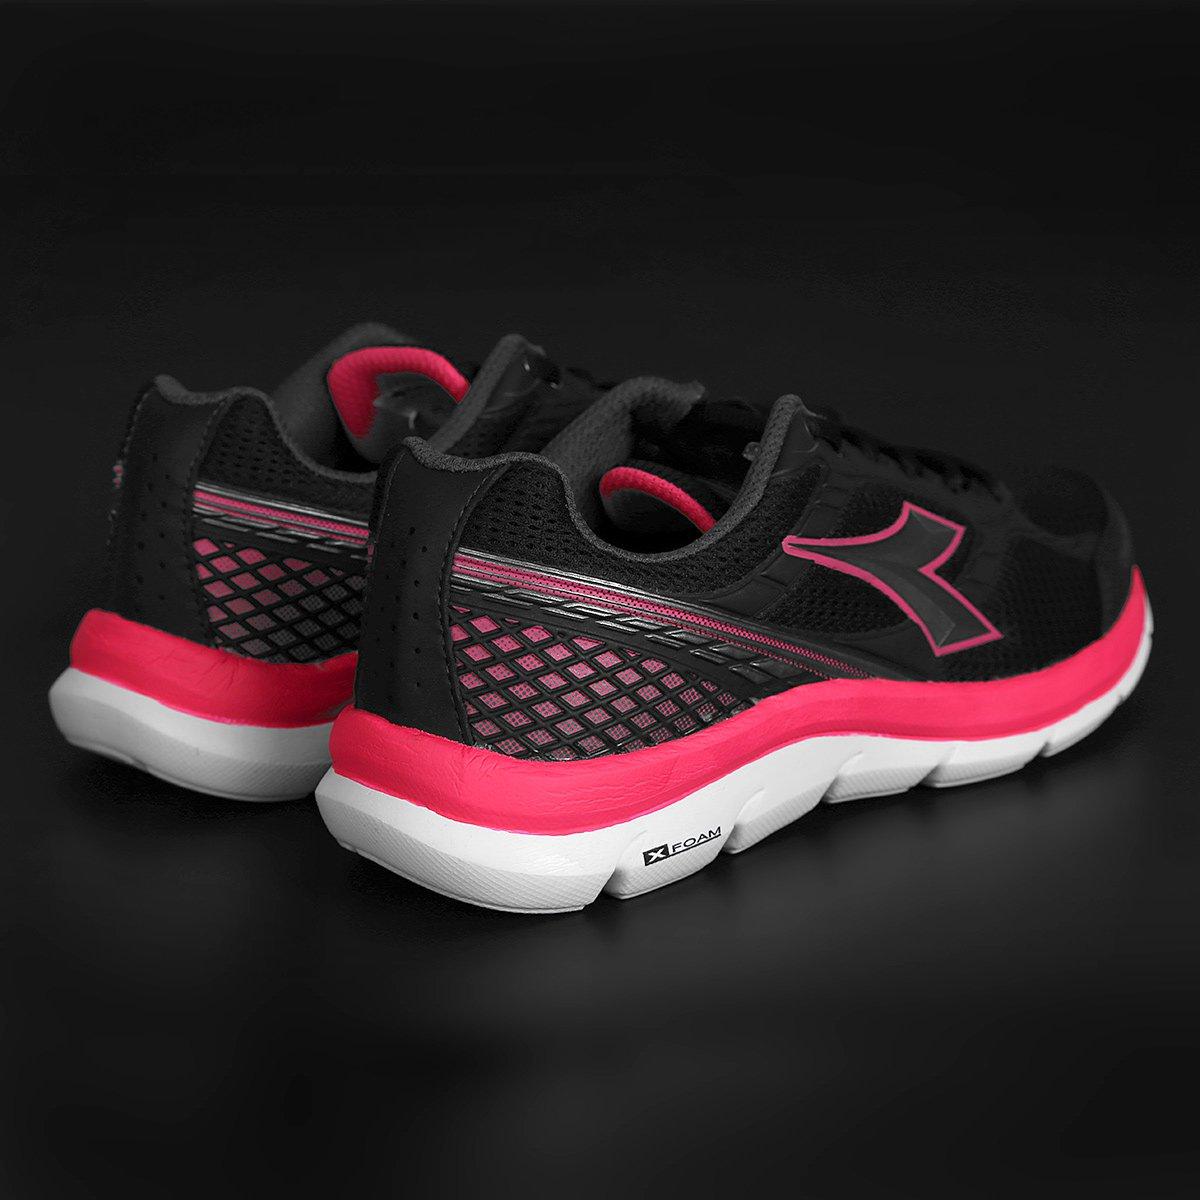 Tênis Diadora Strong Feminino - Preto e Pink - Compre Agora  c65eb7d03135d